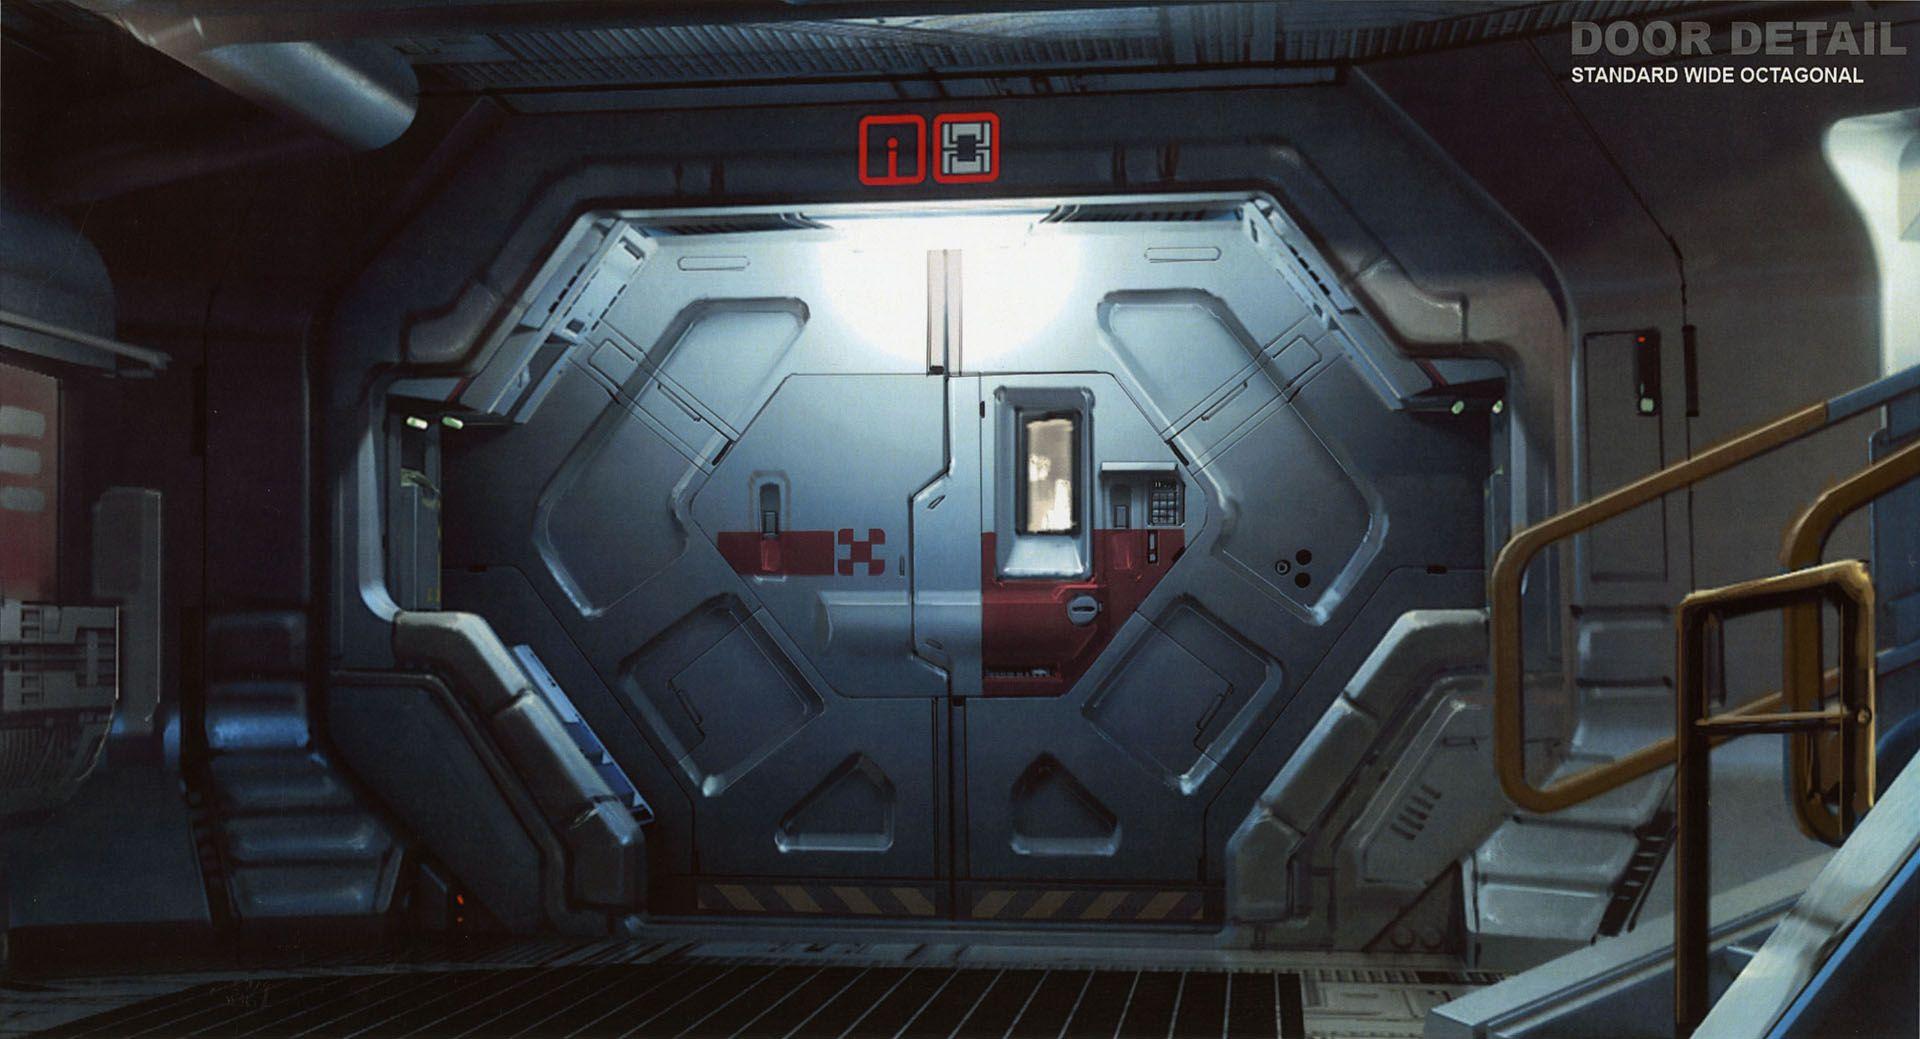 prometheus door hatch corridor sci fi spaceship science fiction environments pinterest. Black Bedroom Furniture Sets. Home Design Ideas